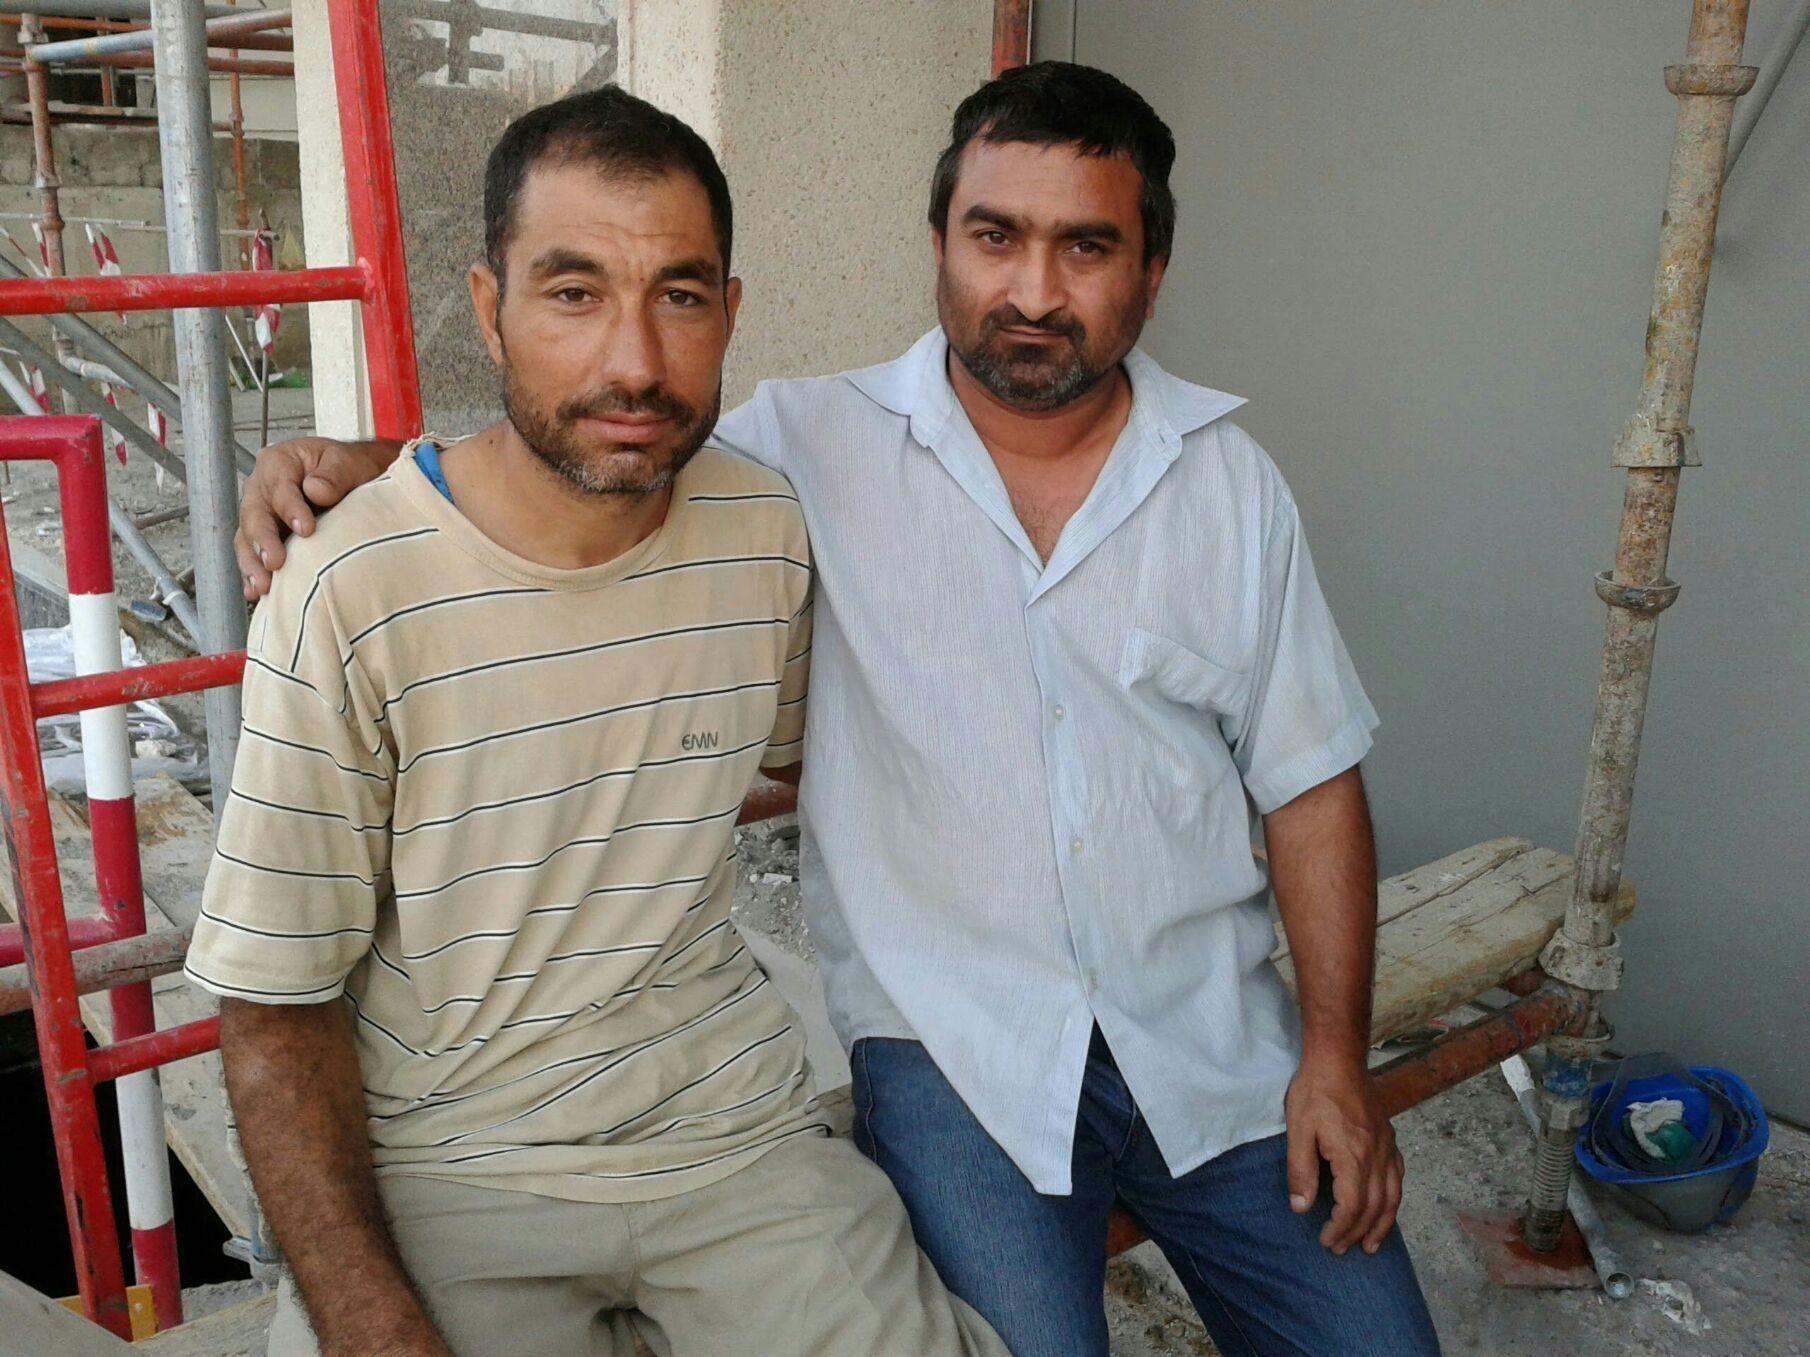 Me and my turkish friend